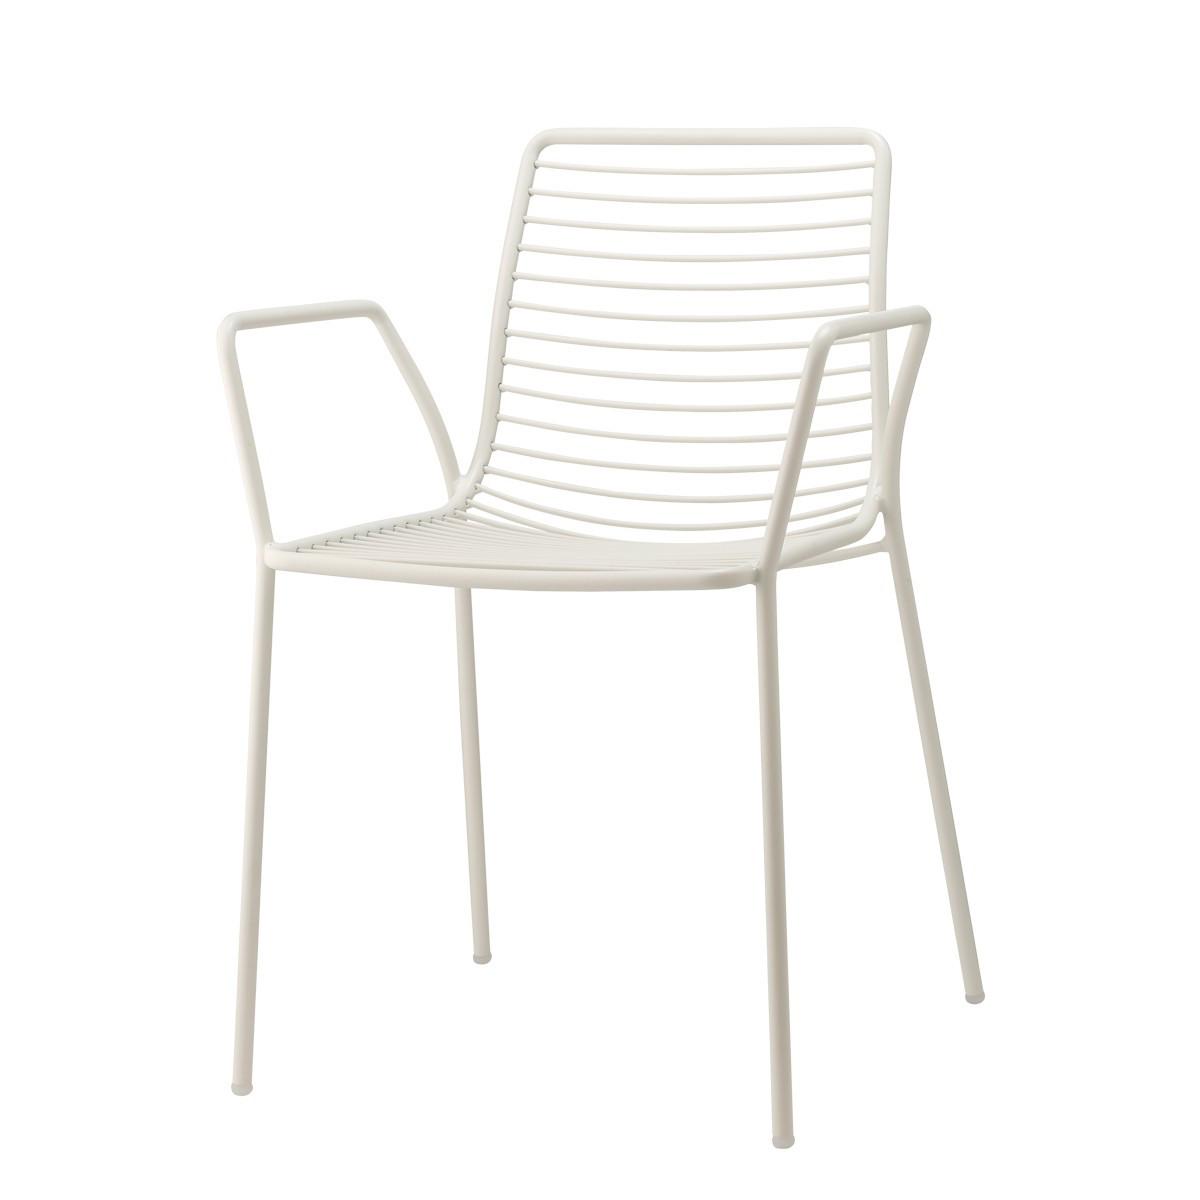 Крісло  металеве для кафе,ресторану Summer SCAB 57х55,5х80см